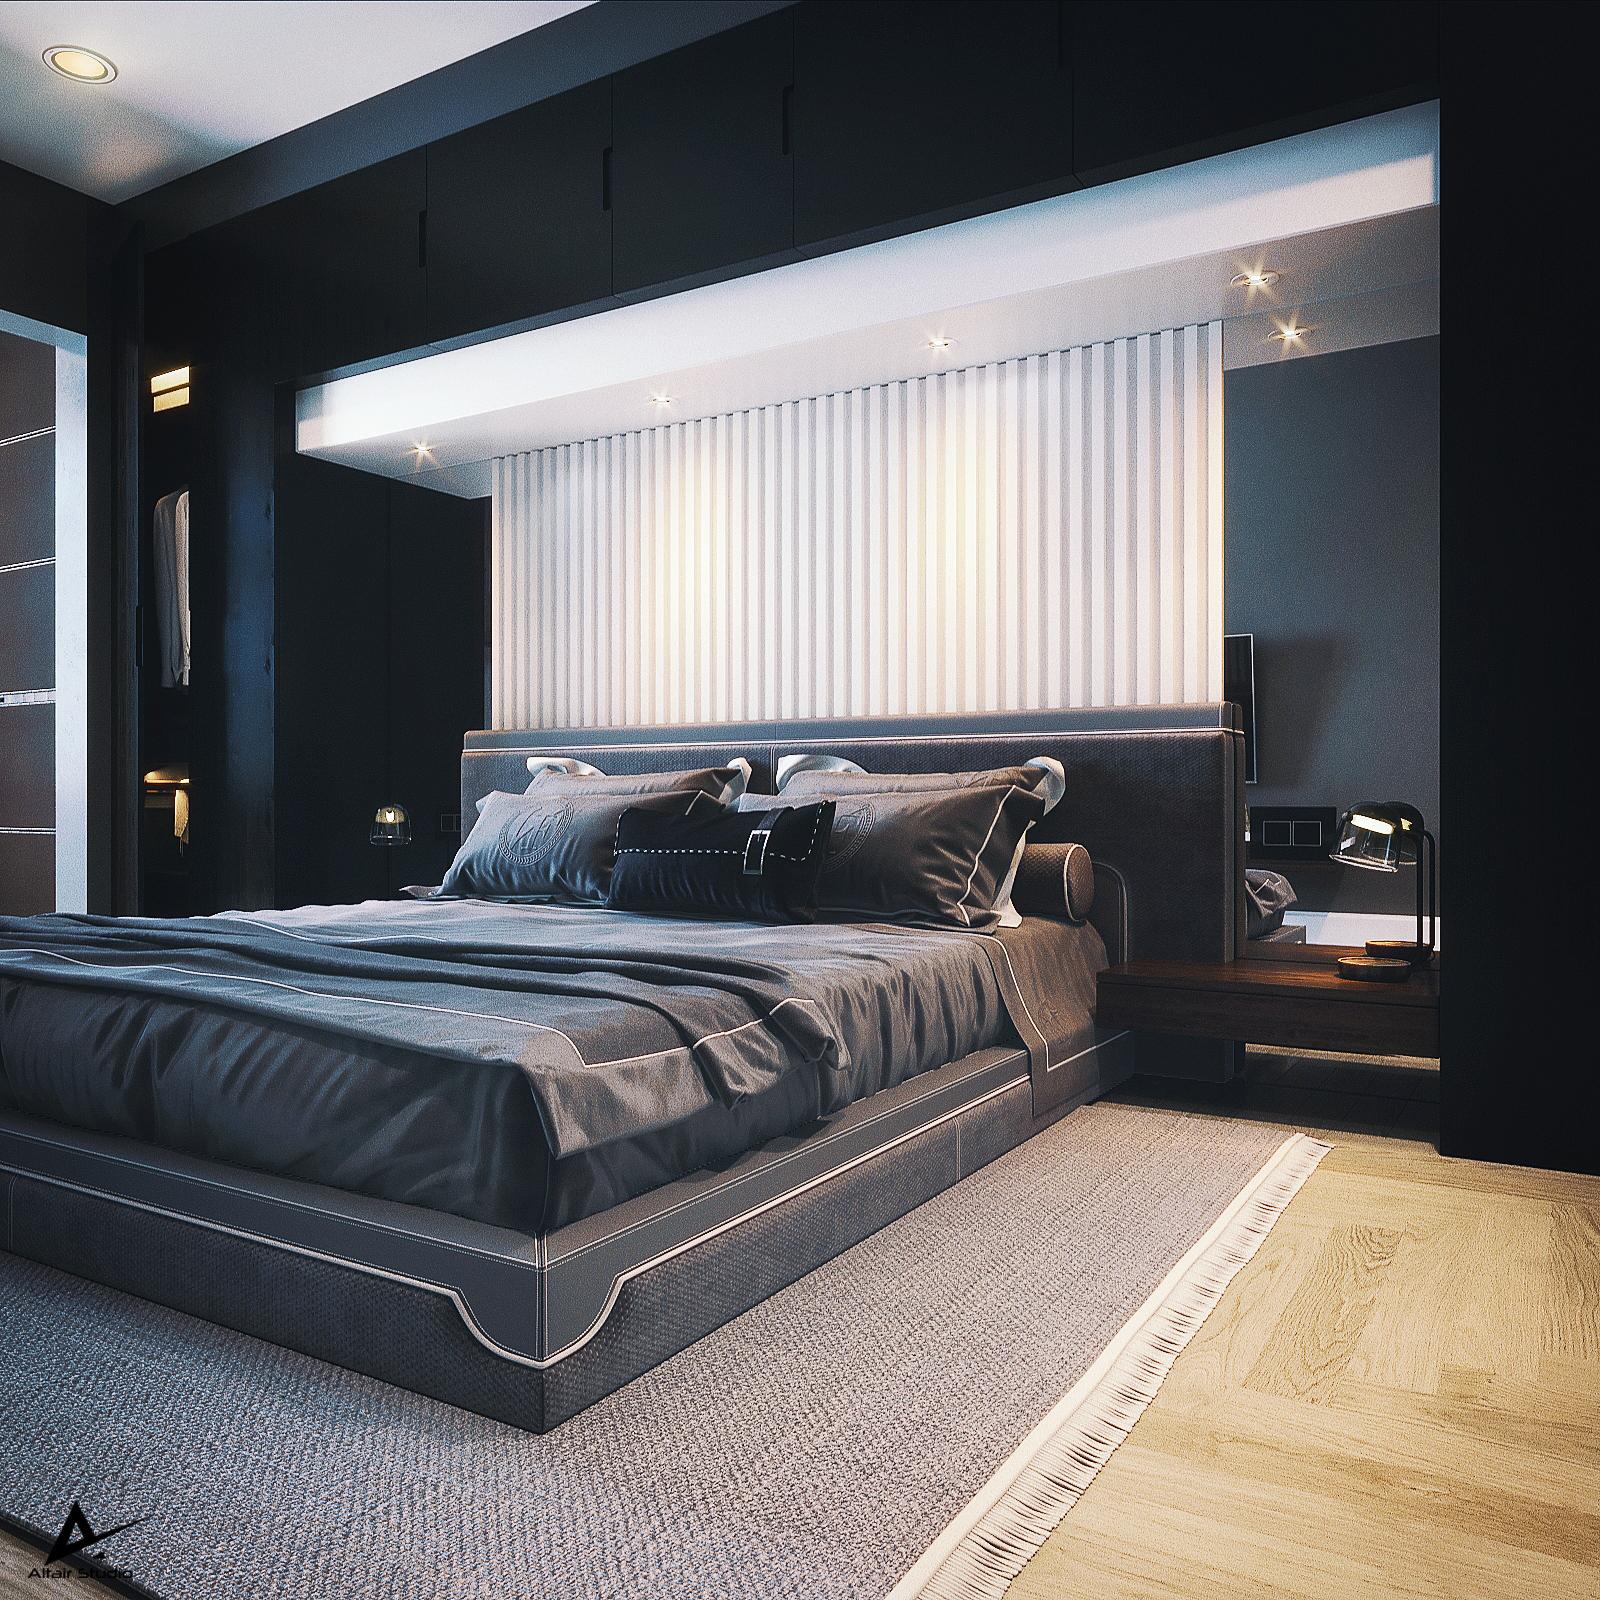 3d visualization of the project in the Modern Dark Bedroom 3d max, render corona render of Farid Muradov